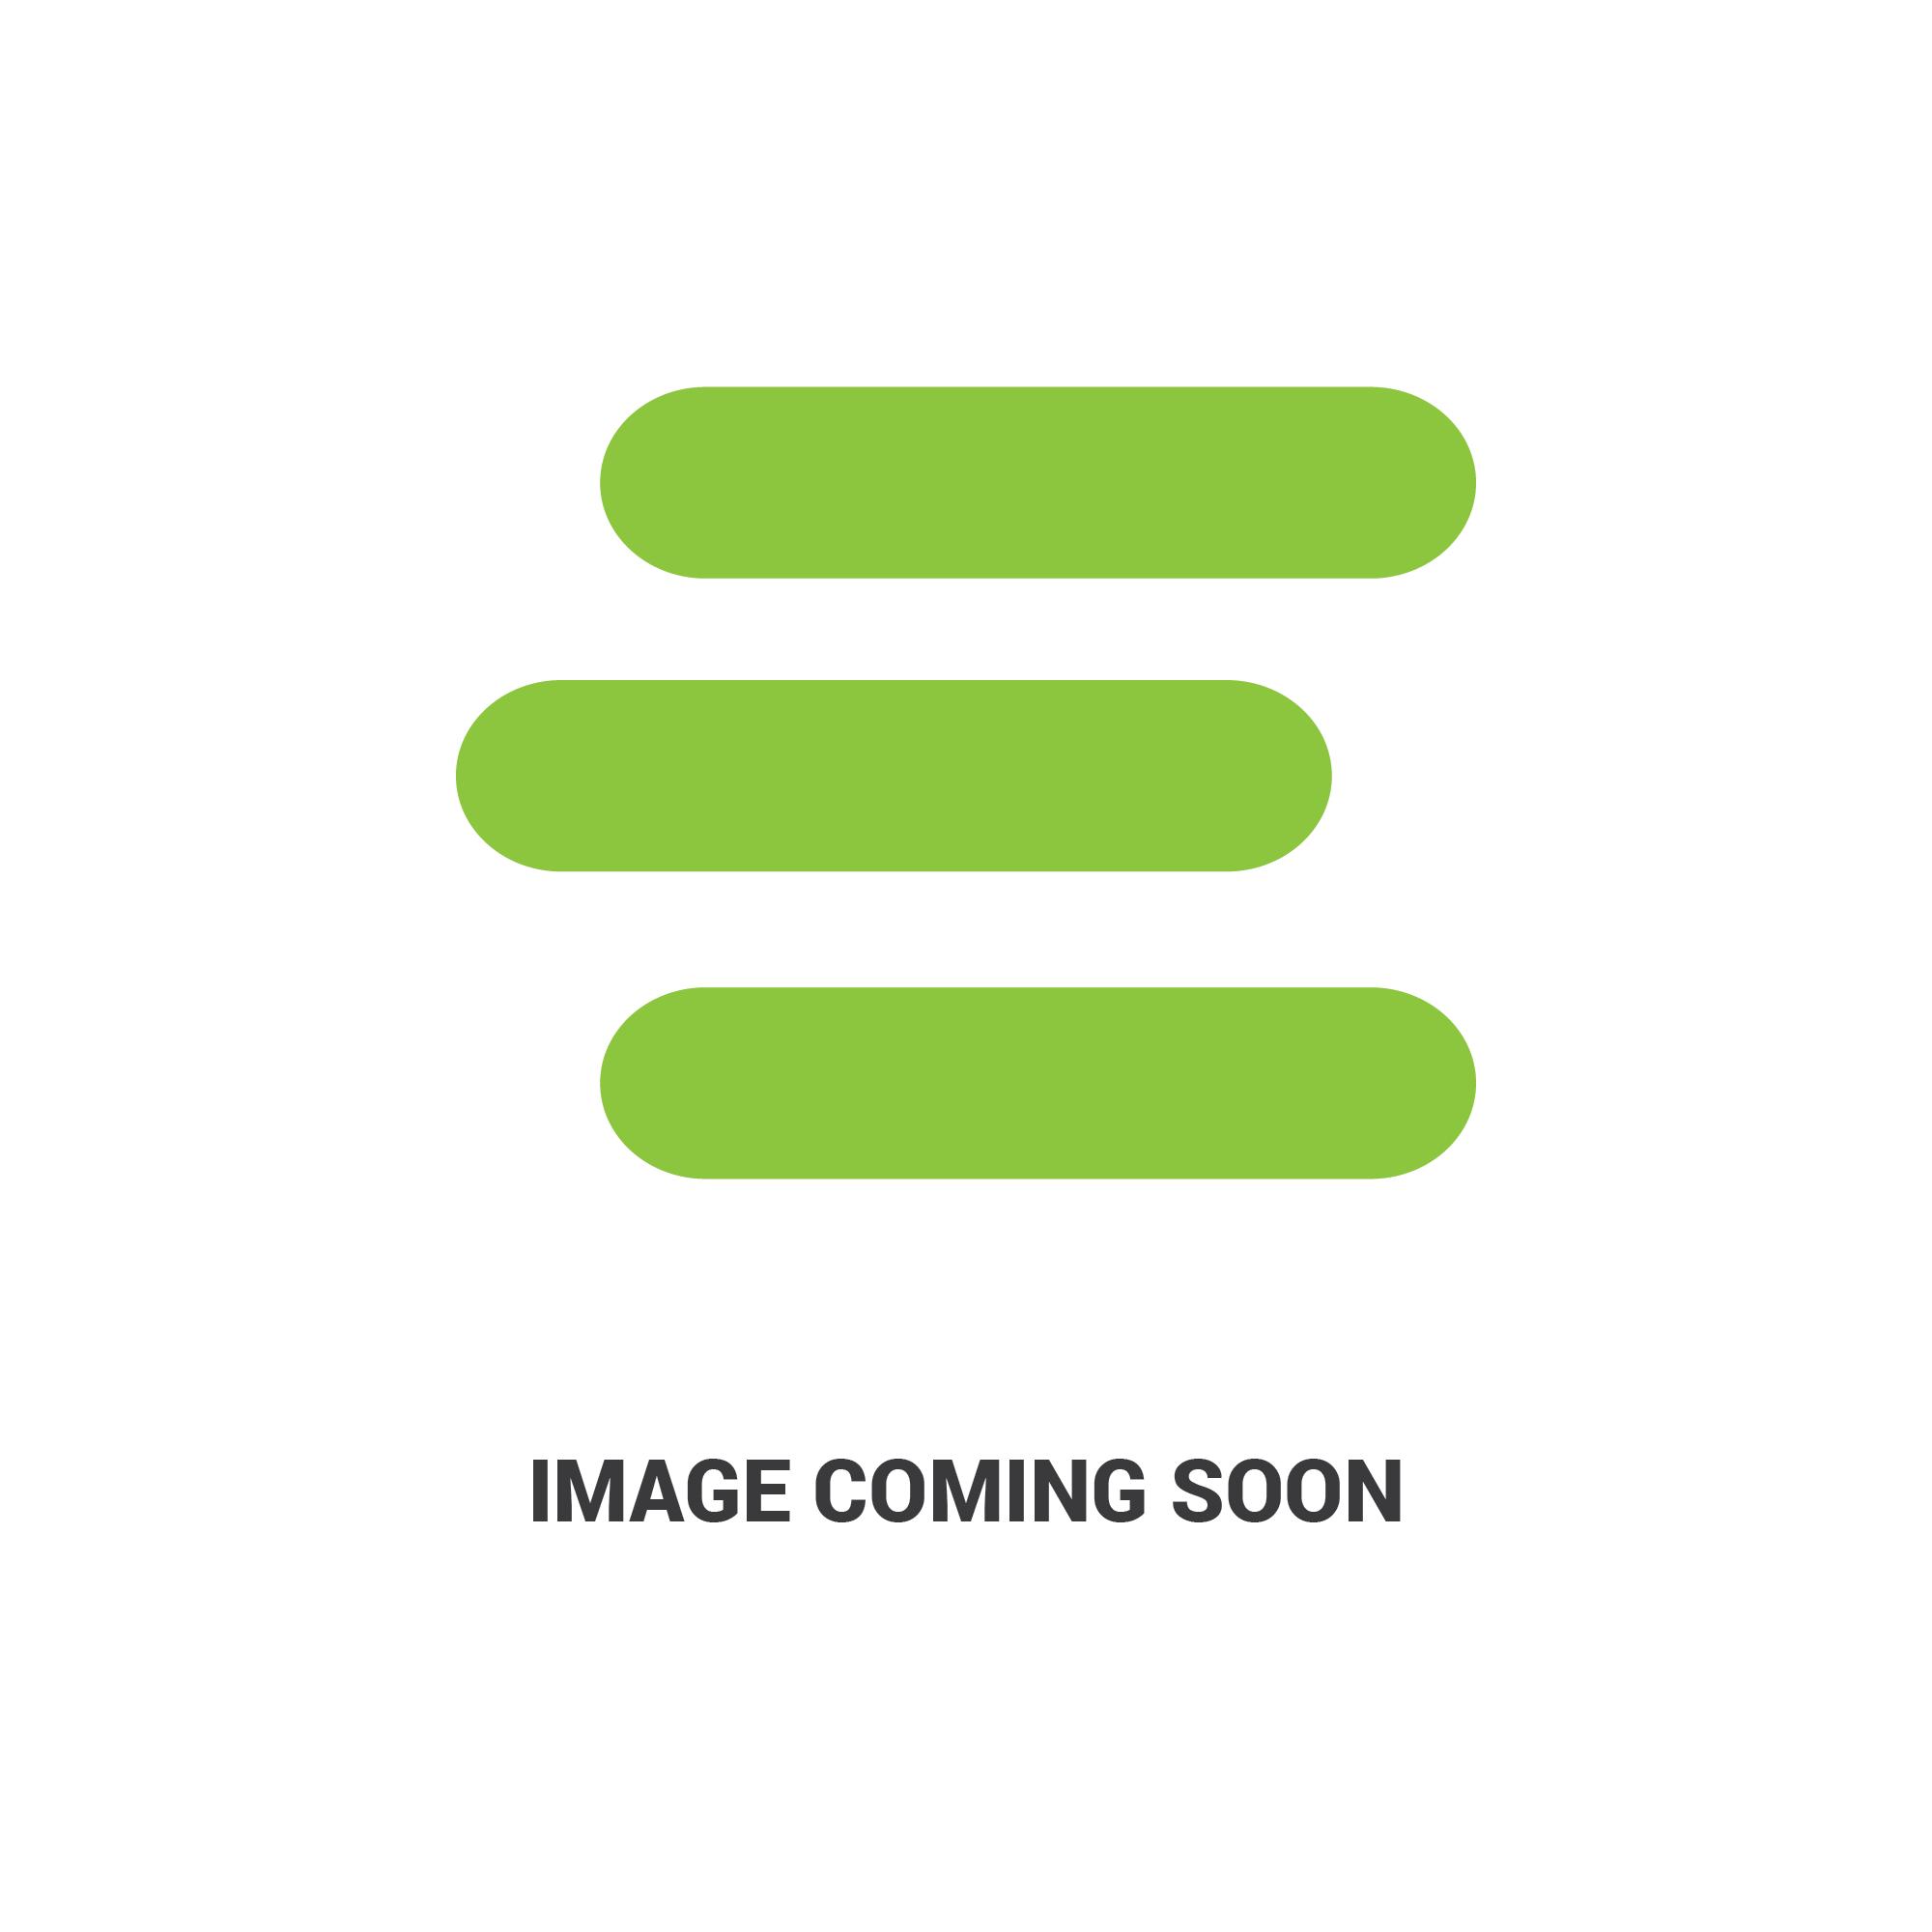 E-F2680Redit 2.jpg